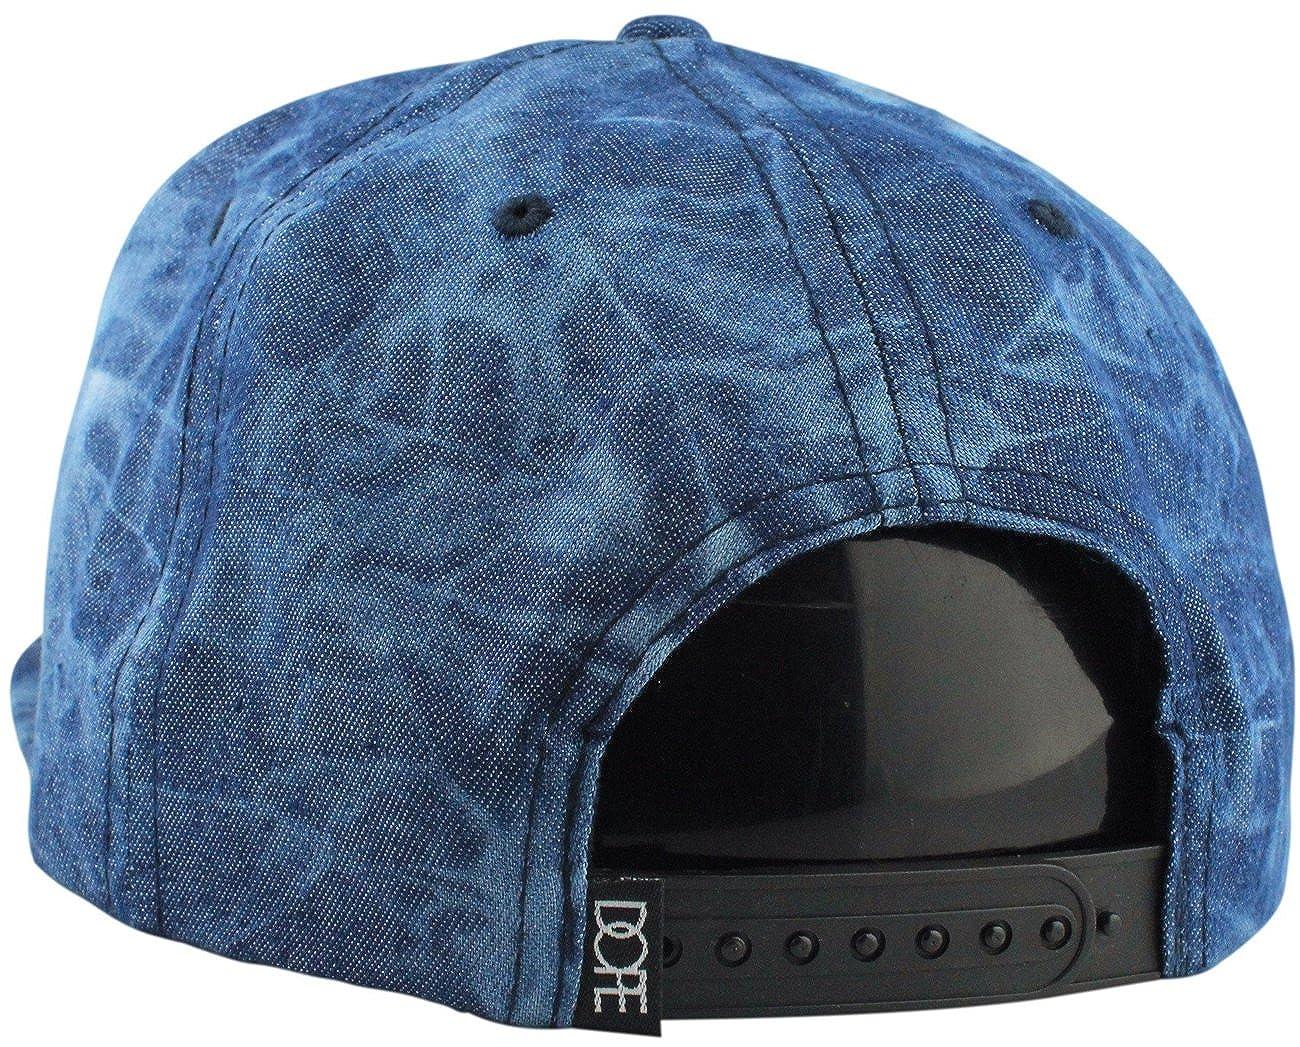 Dope Couture Bull Denim Snapback Cap Luxury Car Emblem Metal Plate Baseball  Cap (Denim Blue) at Amazon Men s Clothing store  f1ee1d93f61